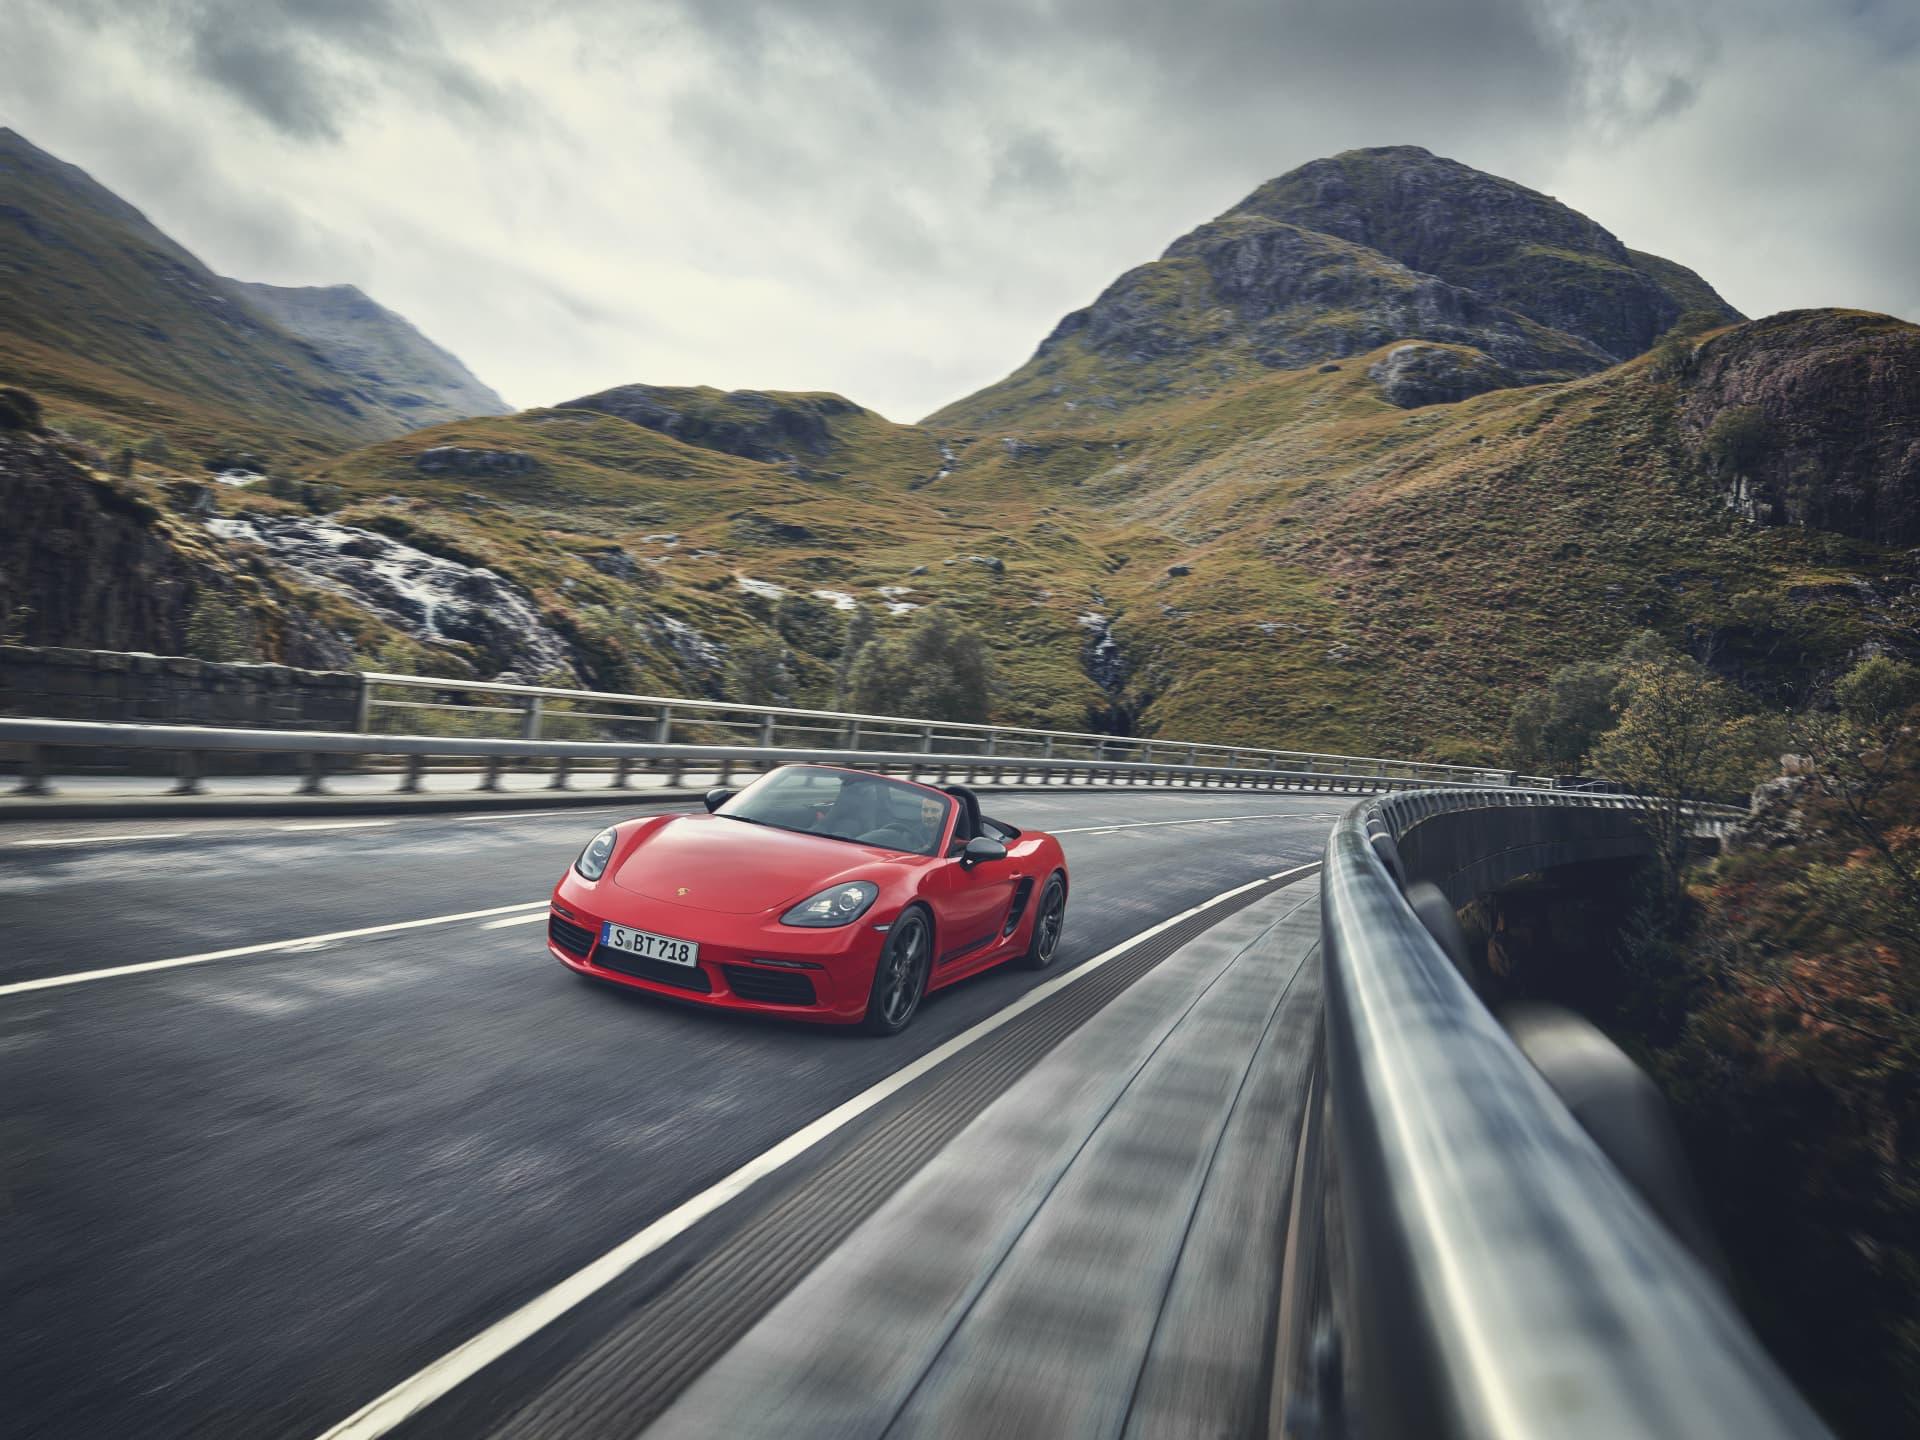 Porsche 718 Cayman Boxster T Dm 6